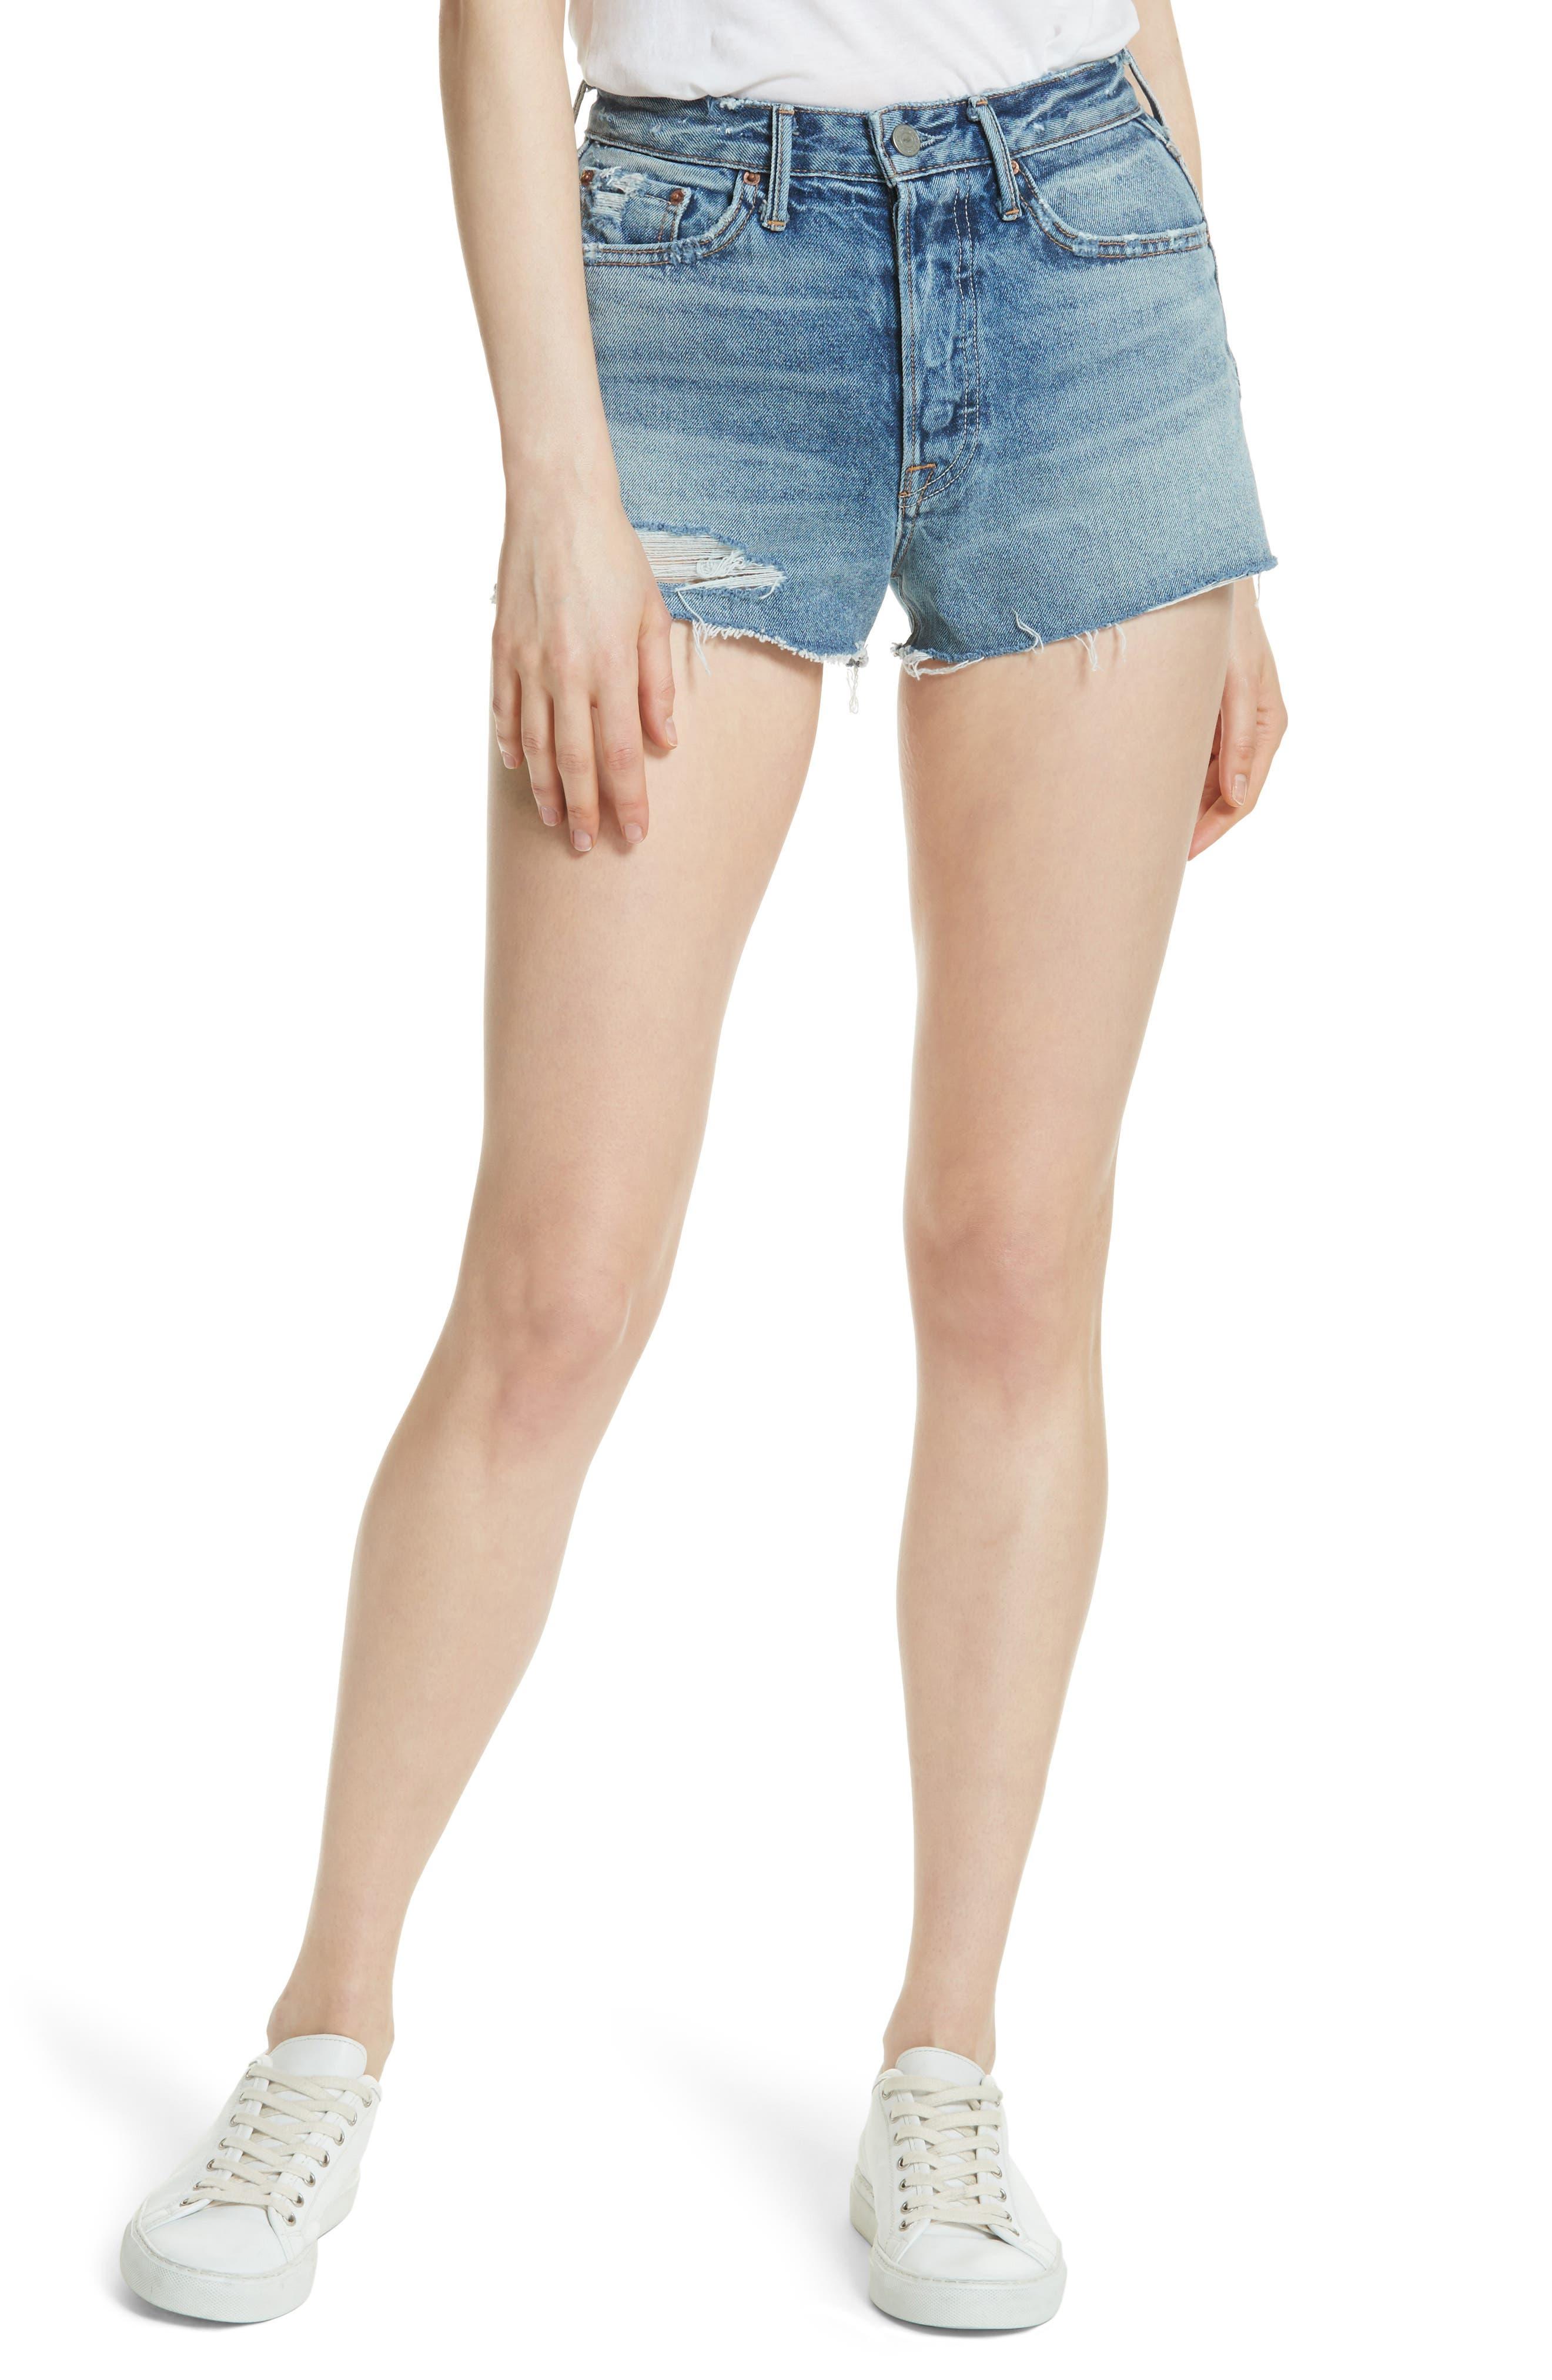 Cindy Rigid High Waist Denim Shorts,                         Main,                         color, Stoned G601